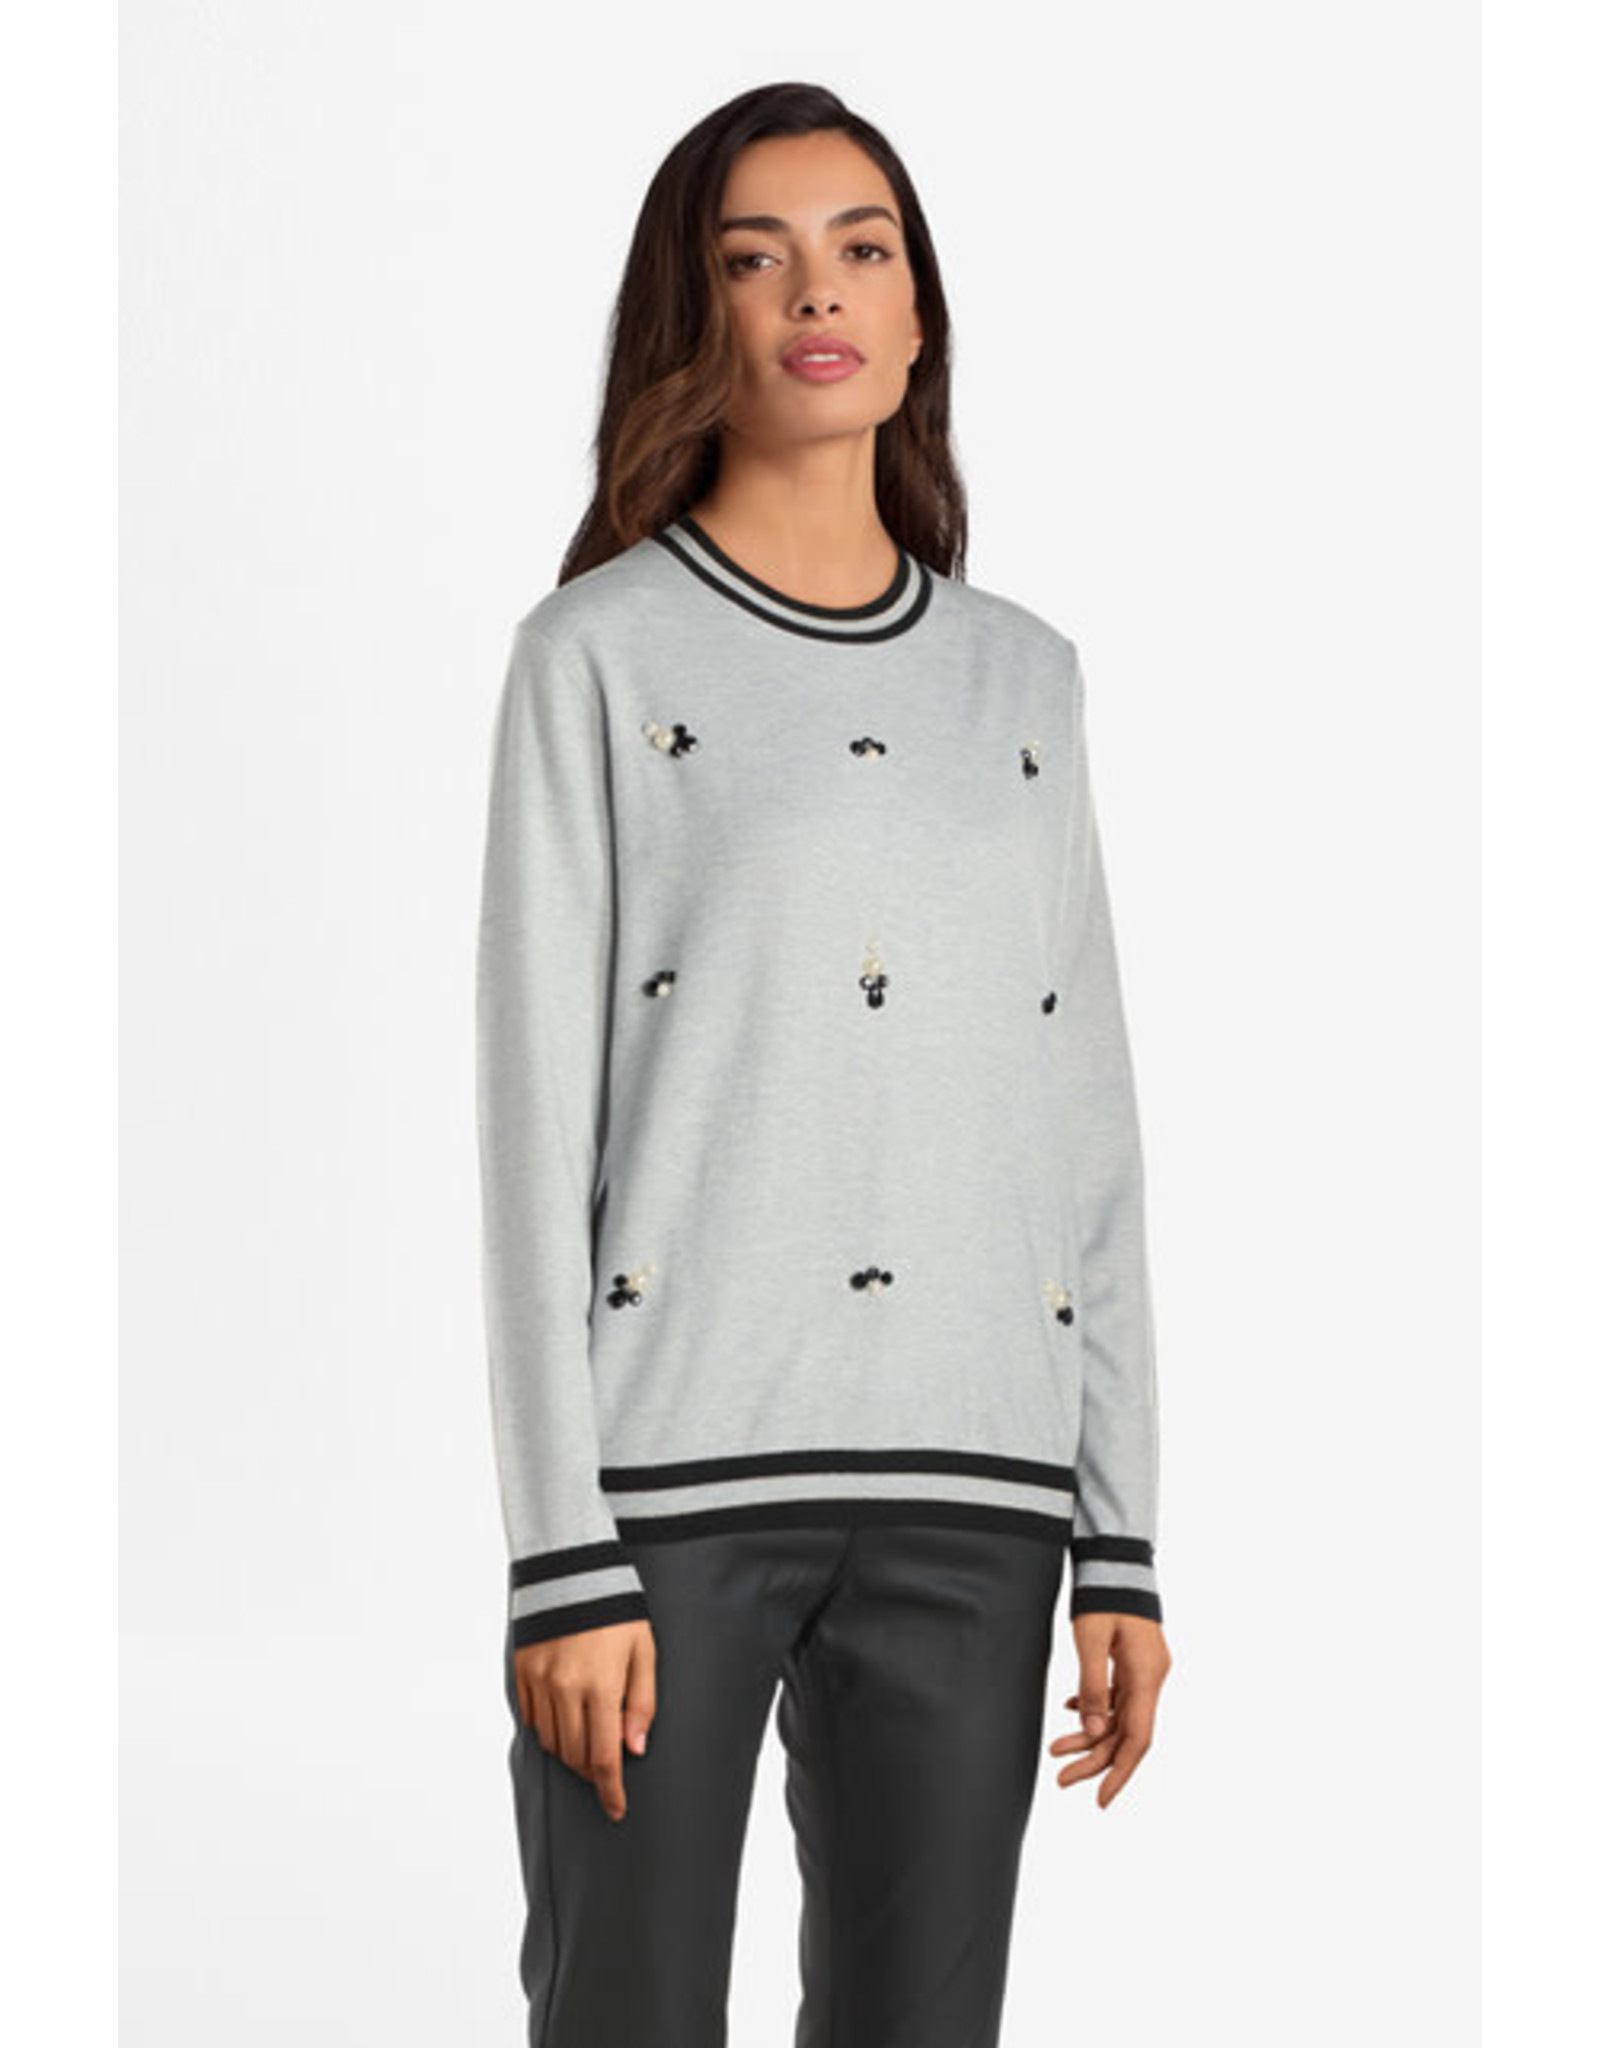 Molly Bracken Molly Bracken - Sweatshirt with Pearl Accents (ash)